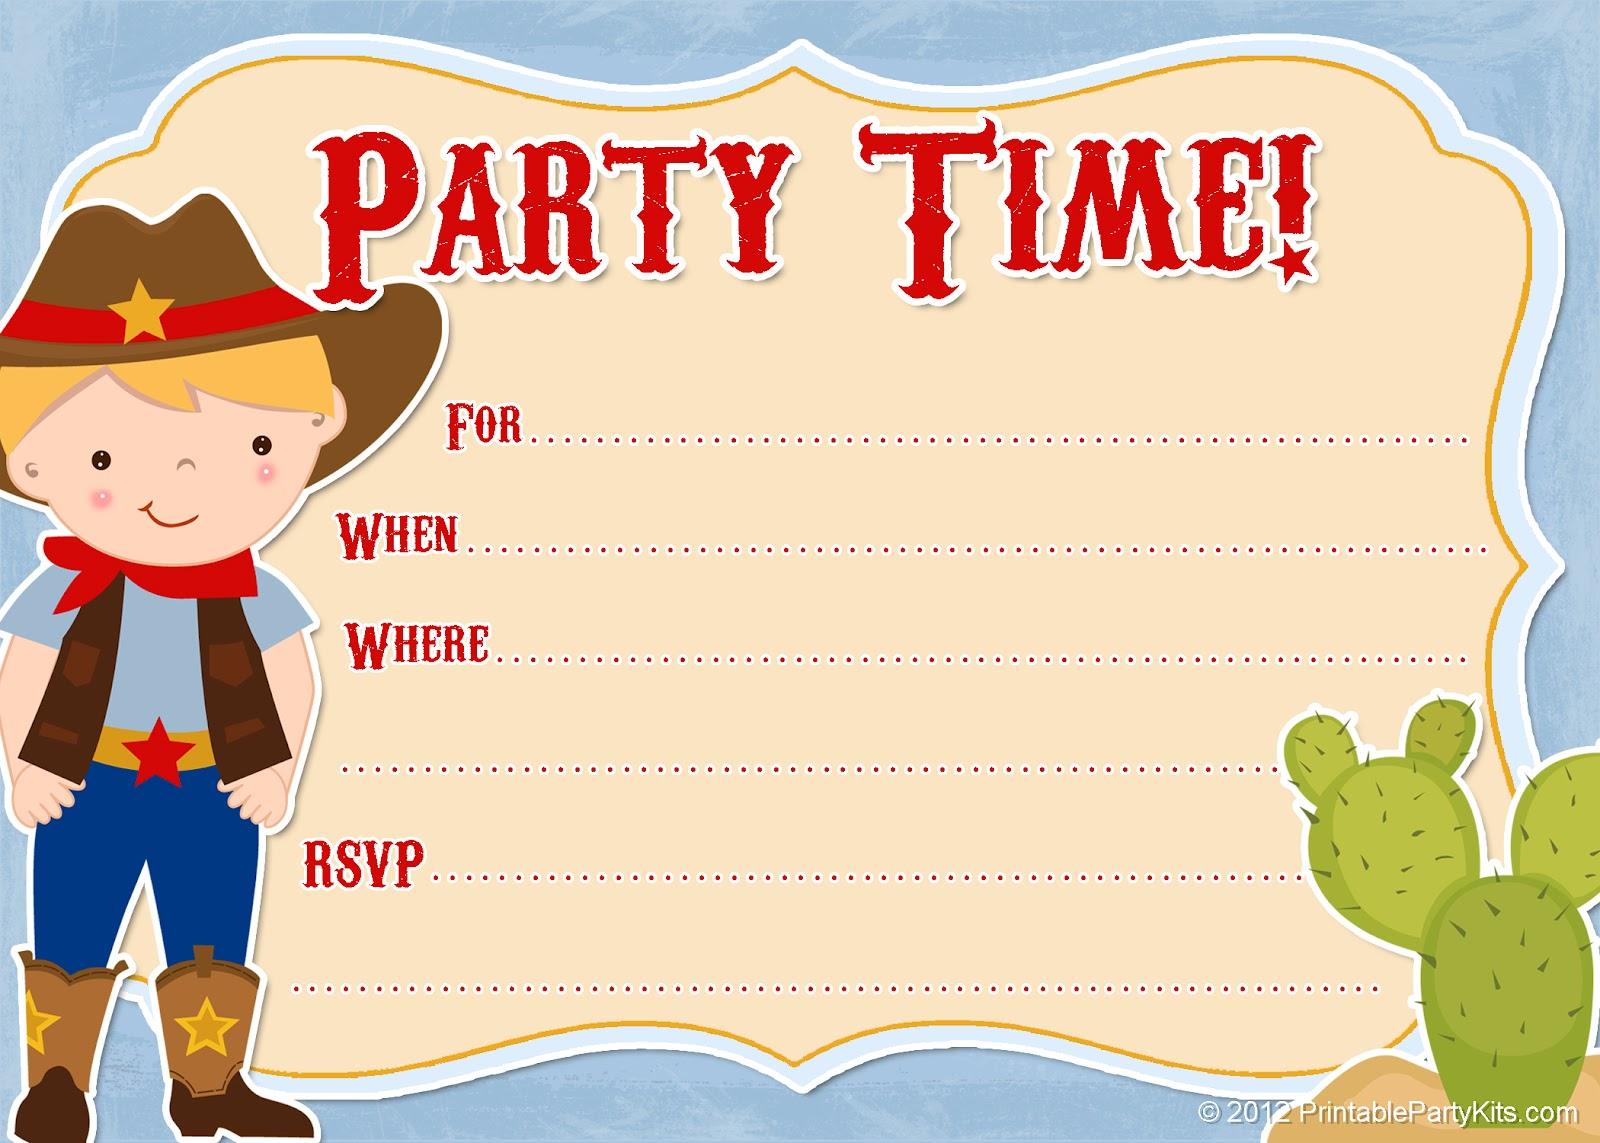 Free Printable Party Invitations: Free Printable Cowboy Invites